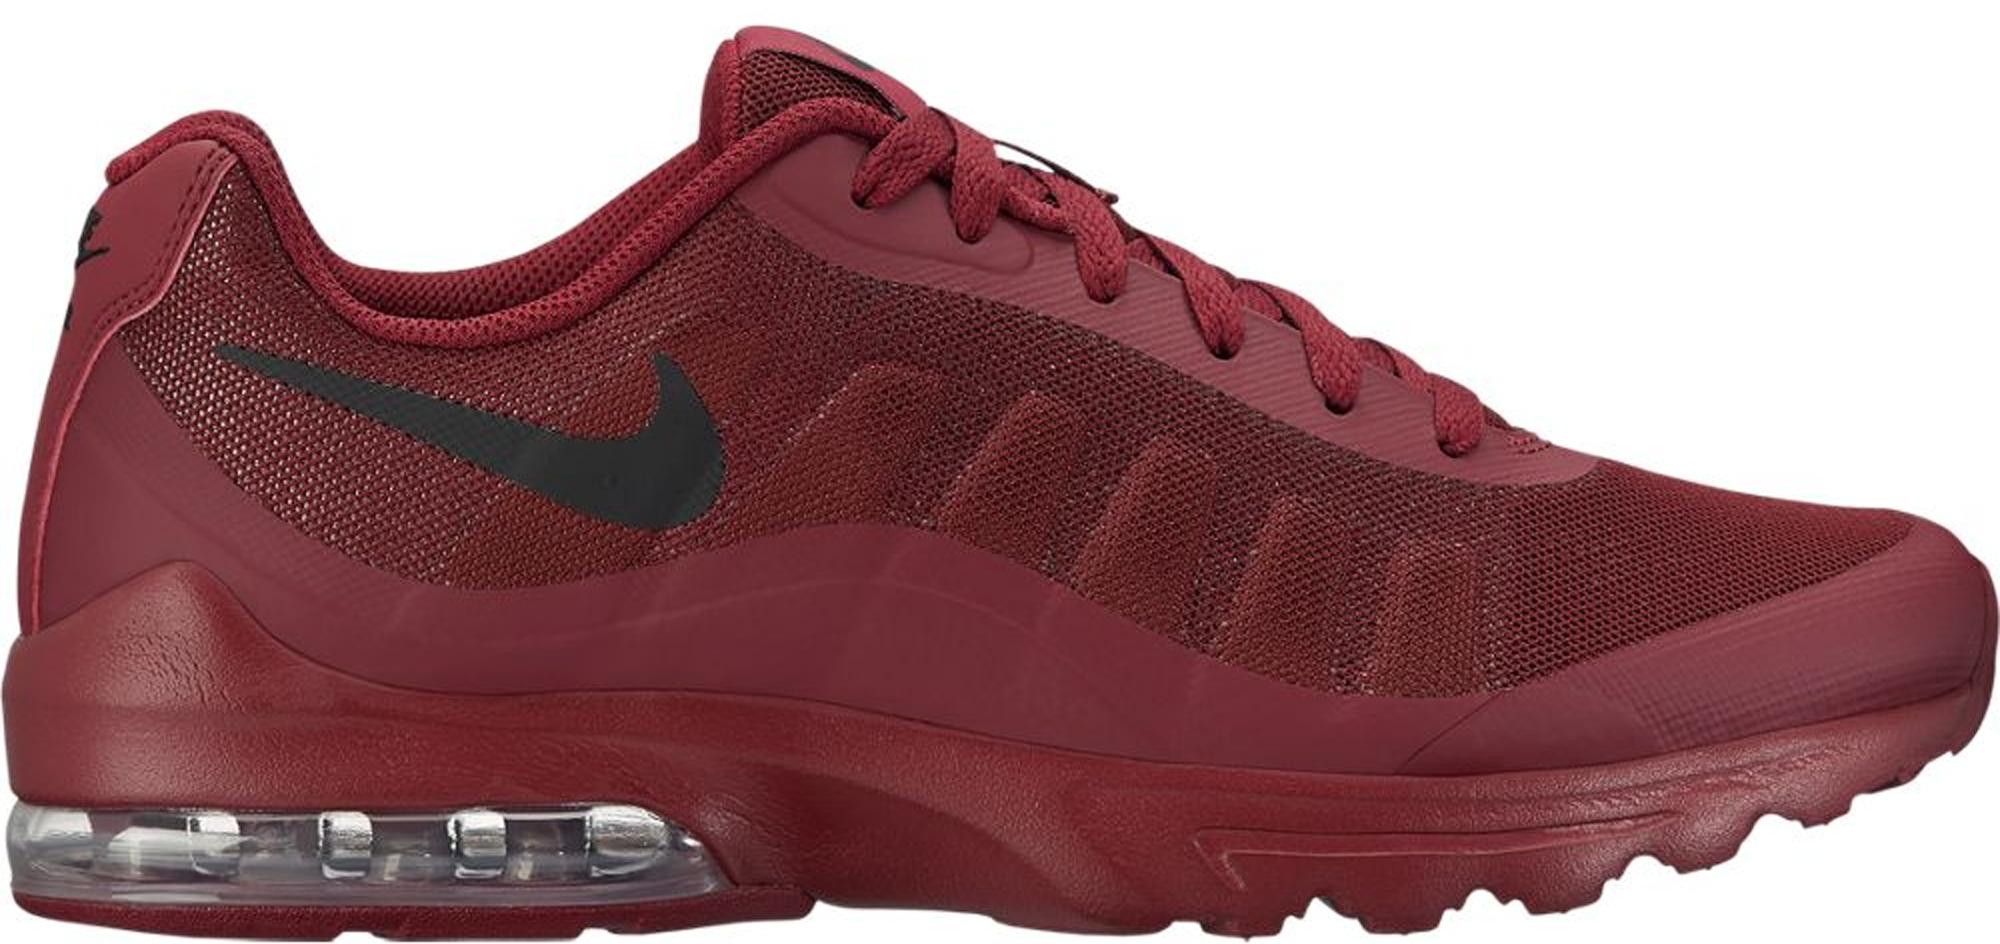 Nike Air Max Invigor Mens 749680-601 Team Red Black Running Shoes 9 9.5 11.5 13